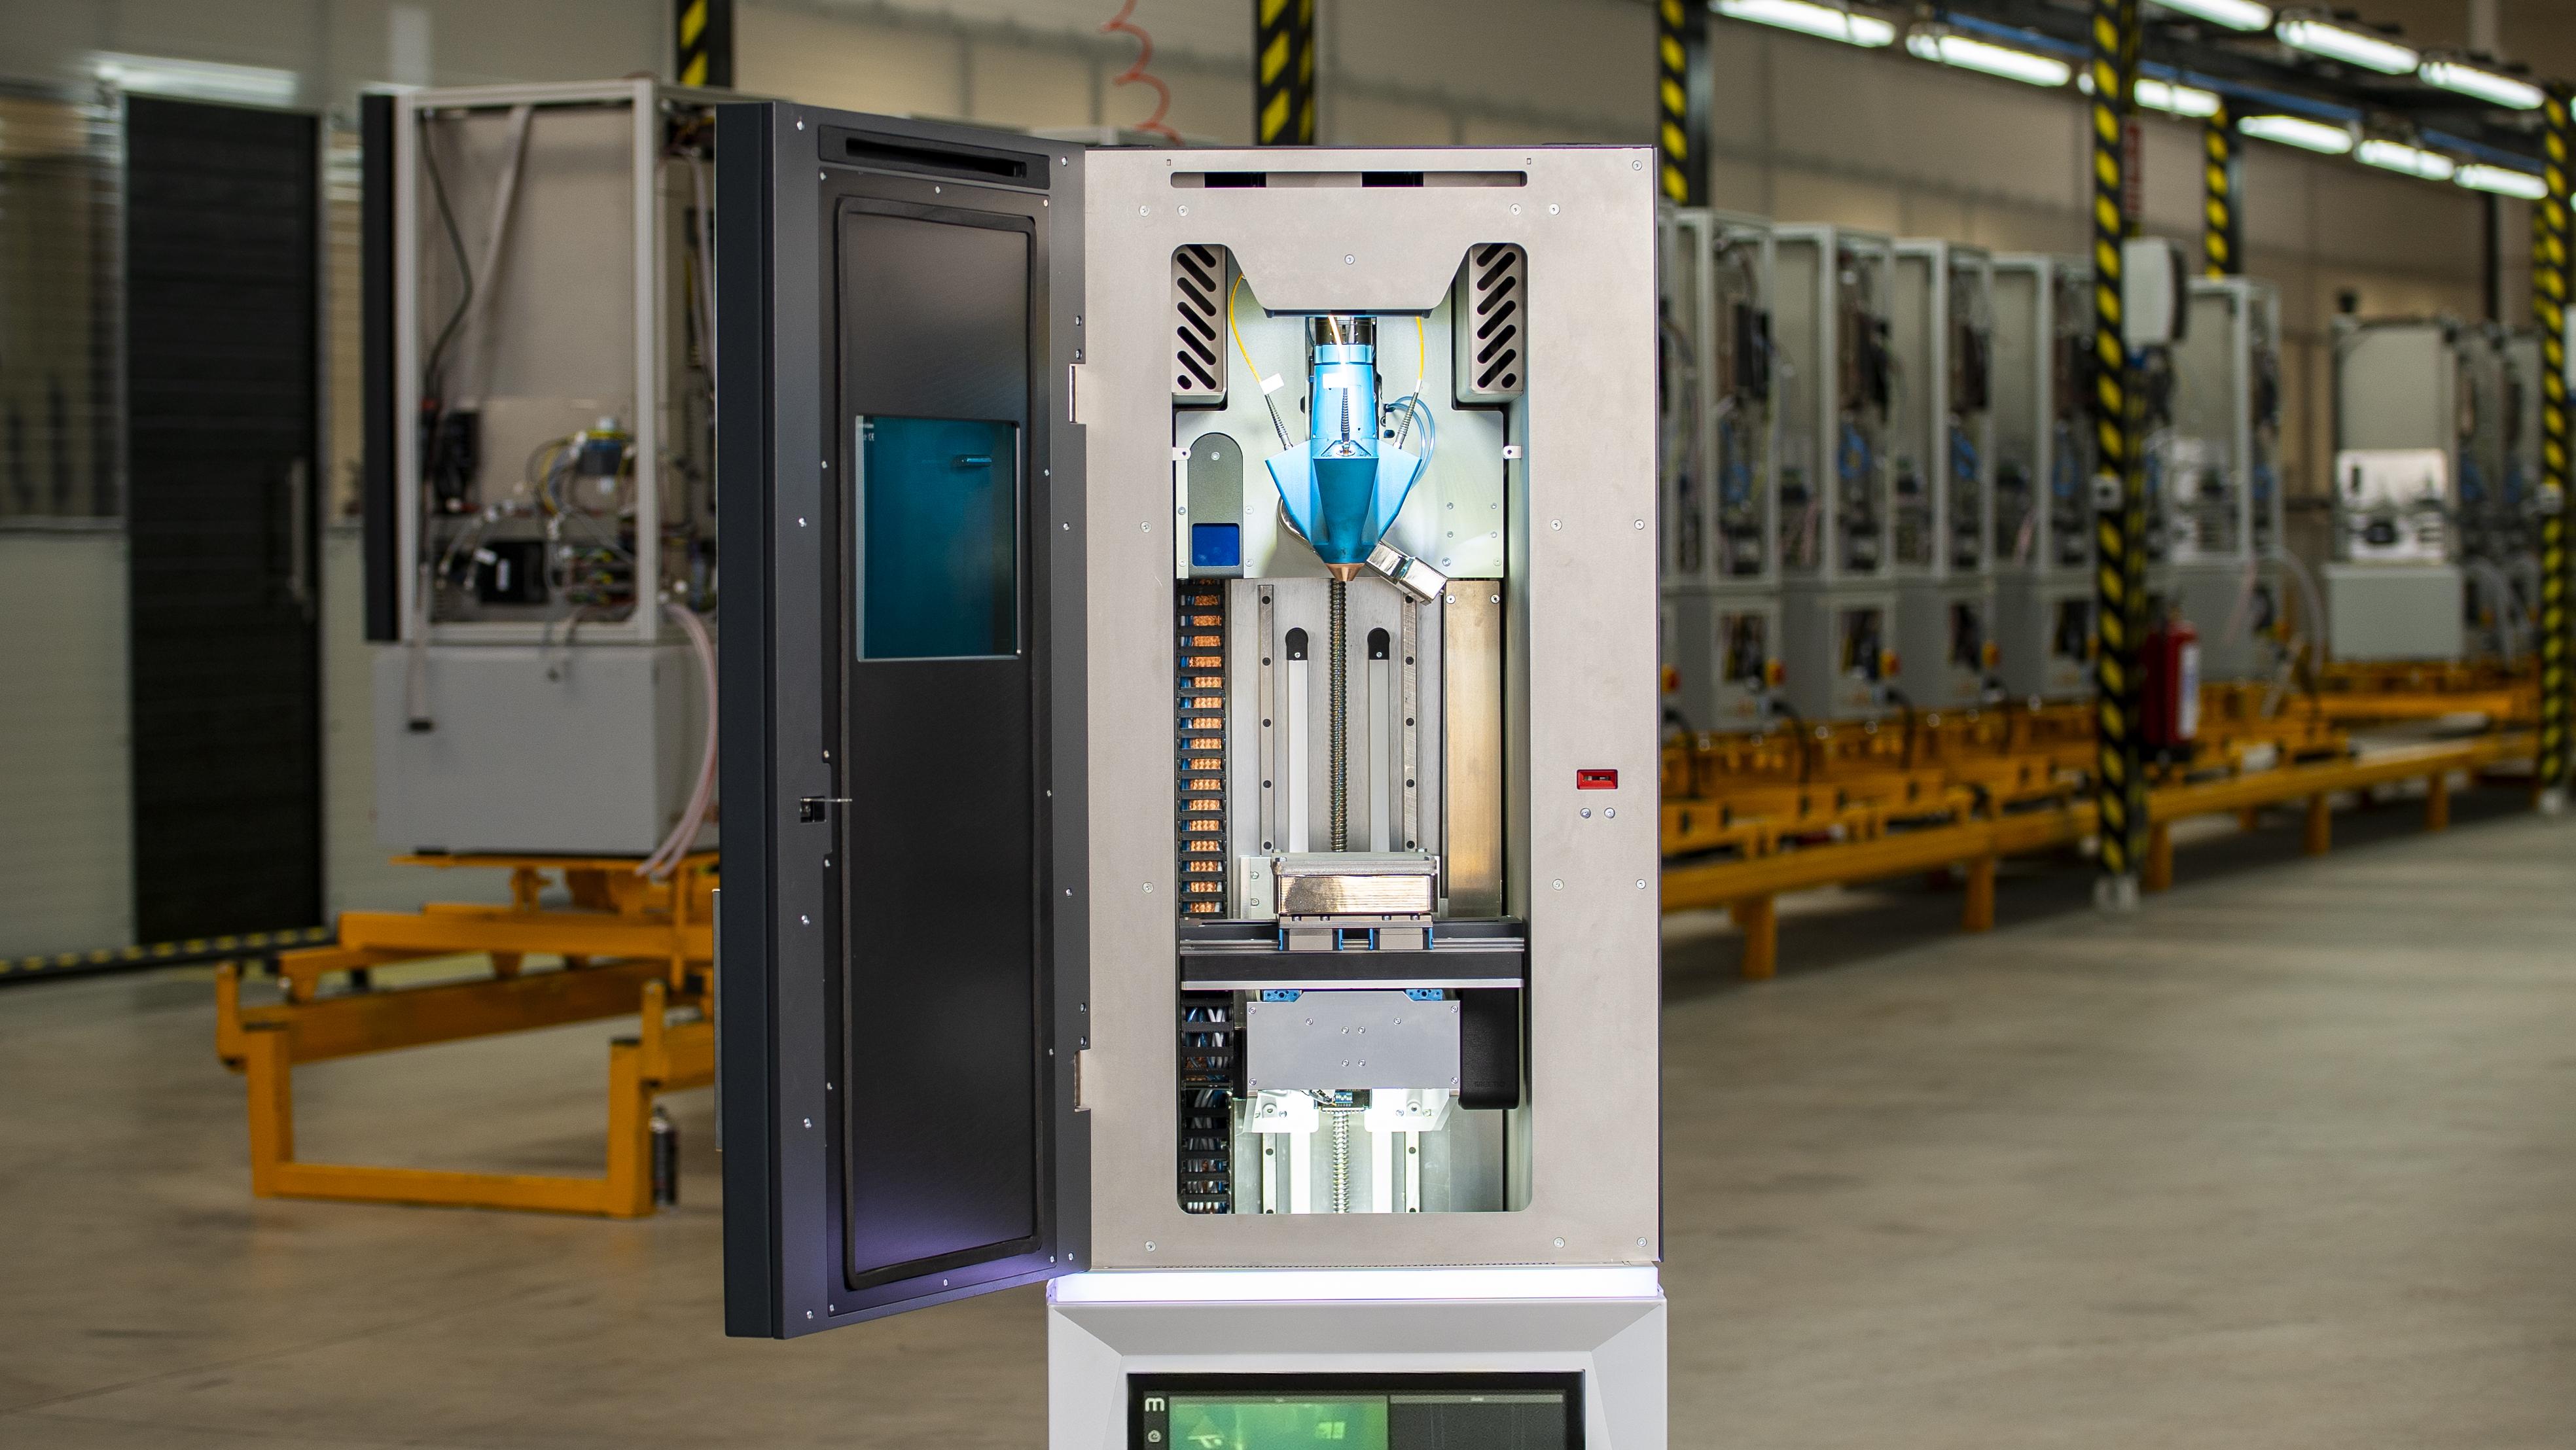 Meltio's M450 small-footprint industrial metal 3D printer. Image via Meltio.